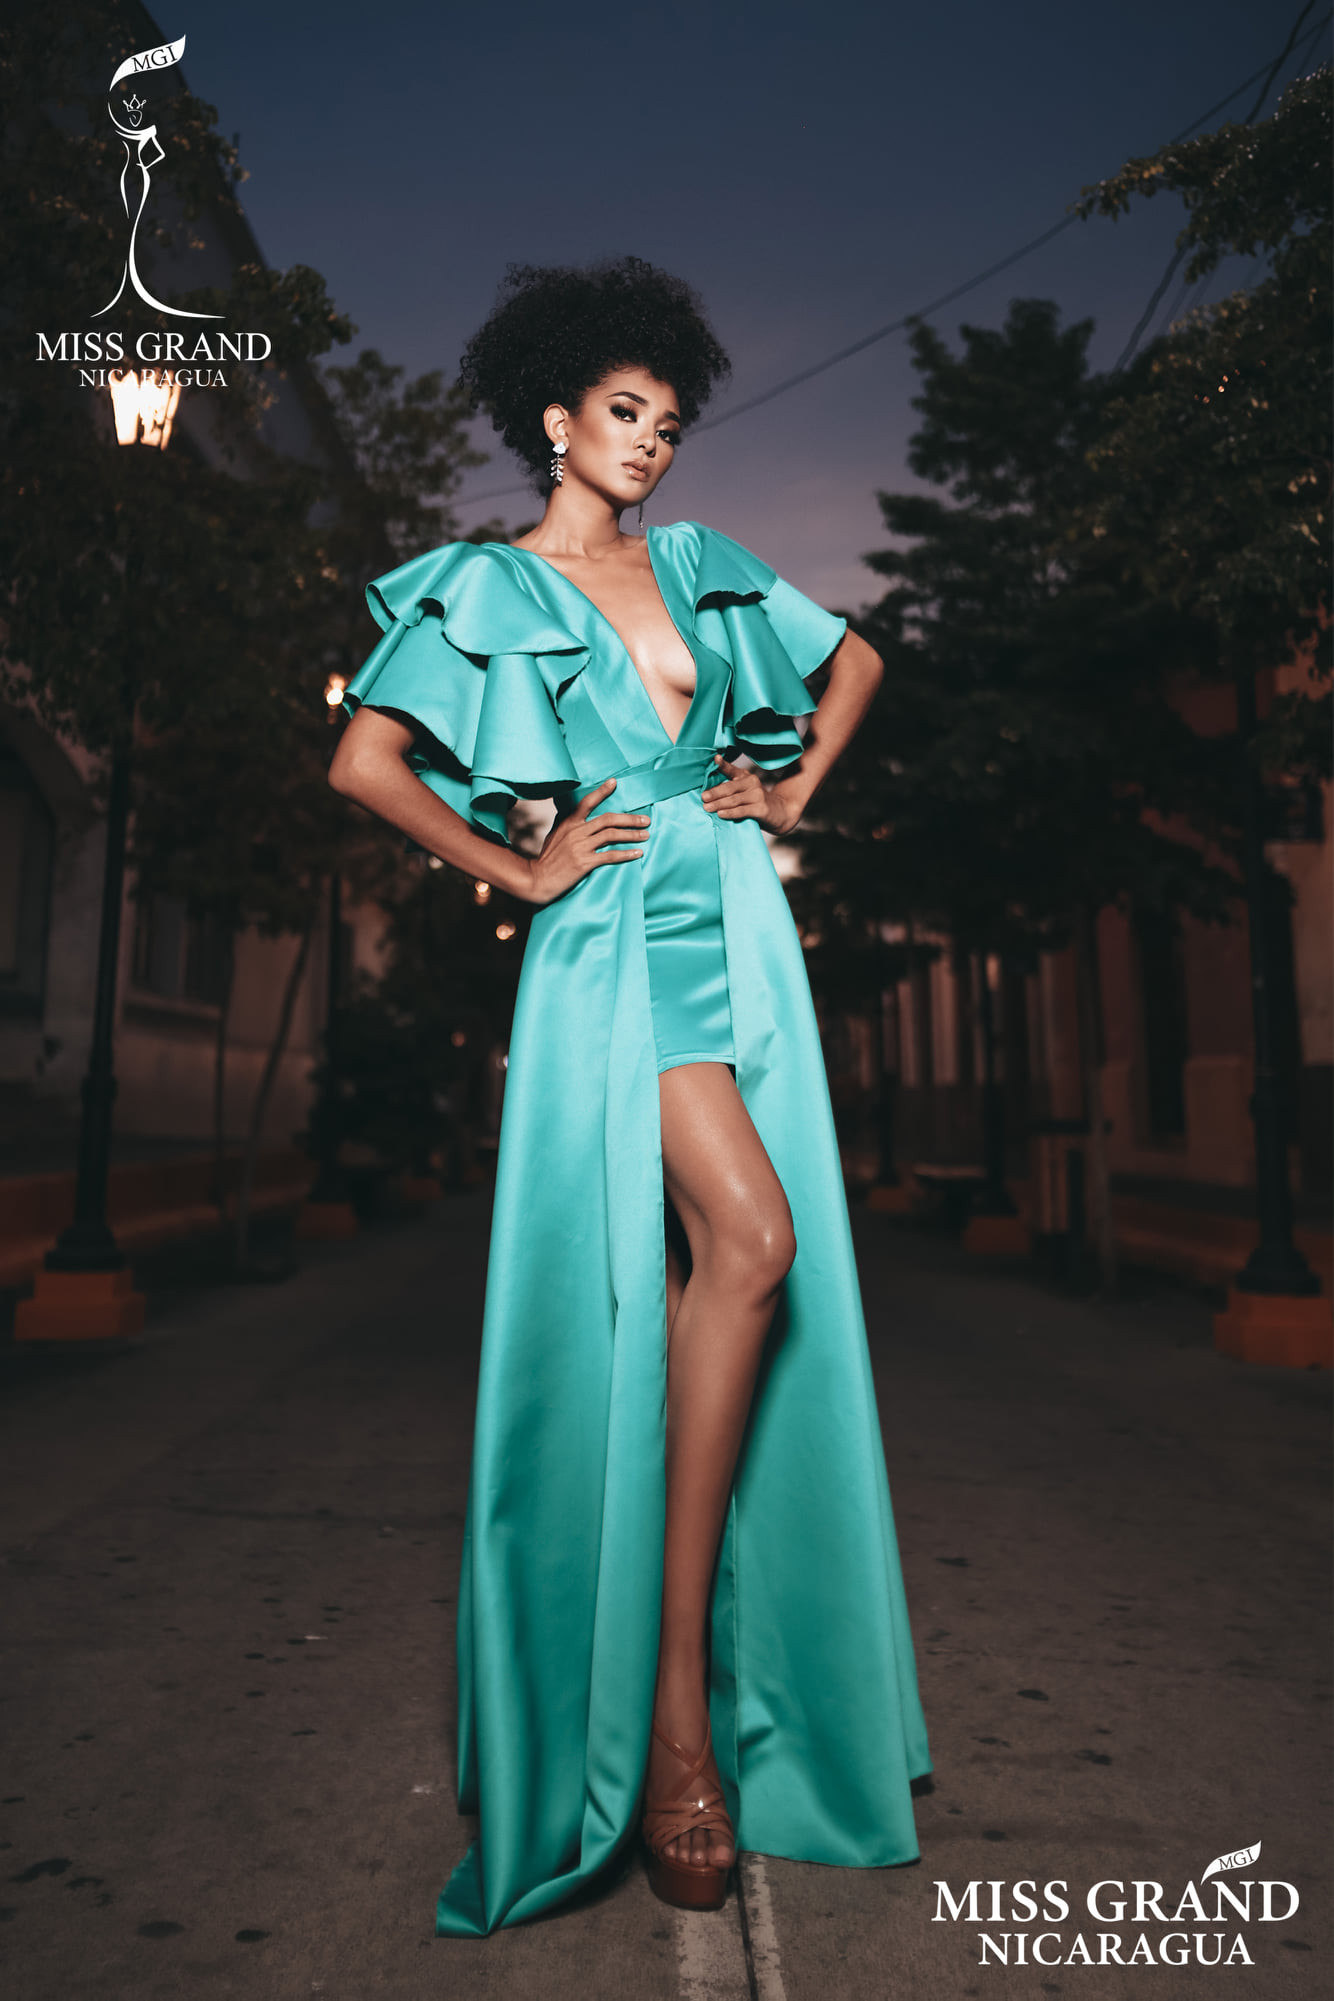 candidatas a miss grand nicaragua 2021. final: 31 july. - Página 2 O5TP5P